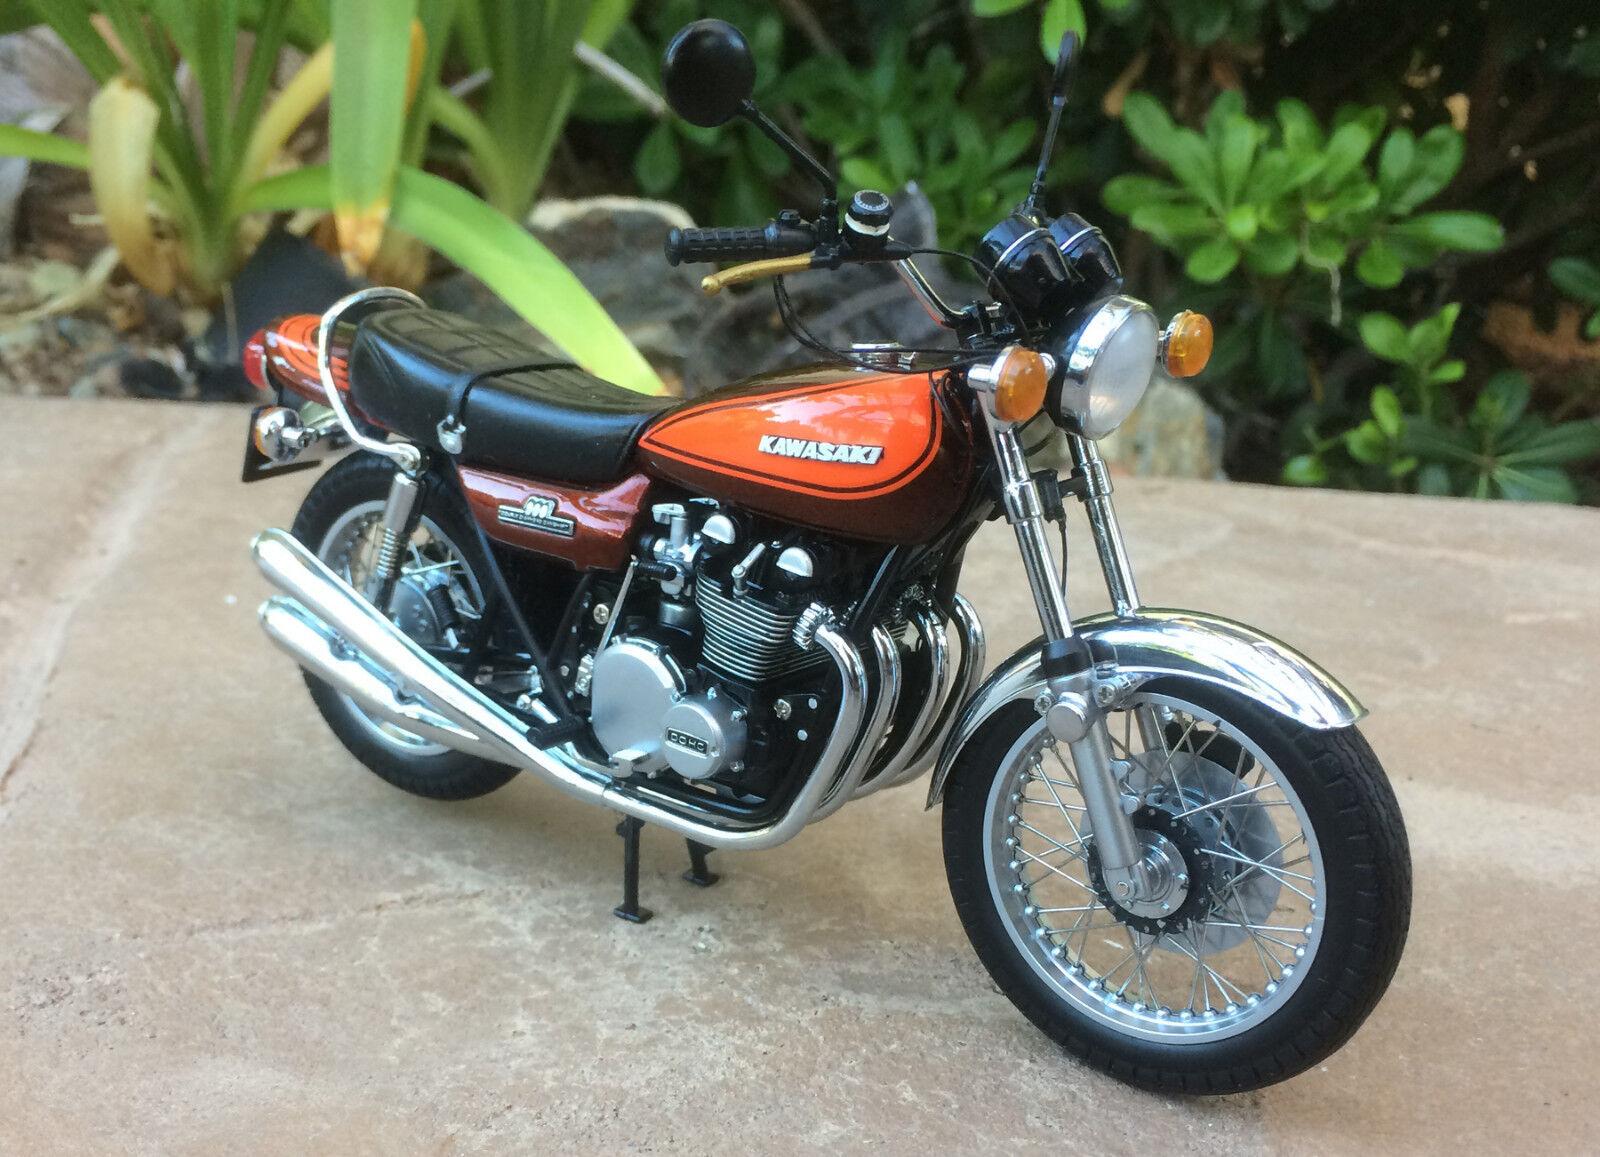 Minichamps 122164100 Kawasaki 900 Z1 1973 braun   Orange 1 12 - NEW